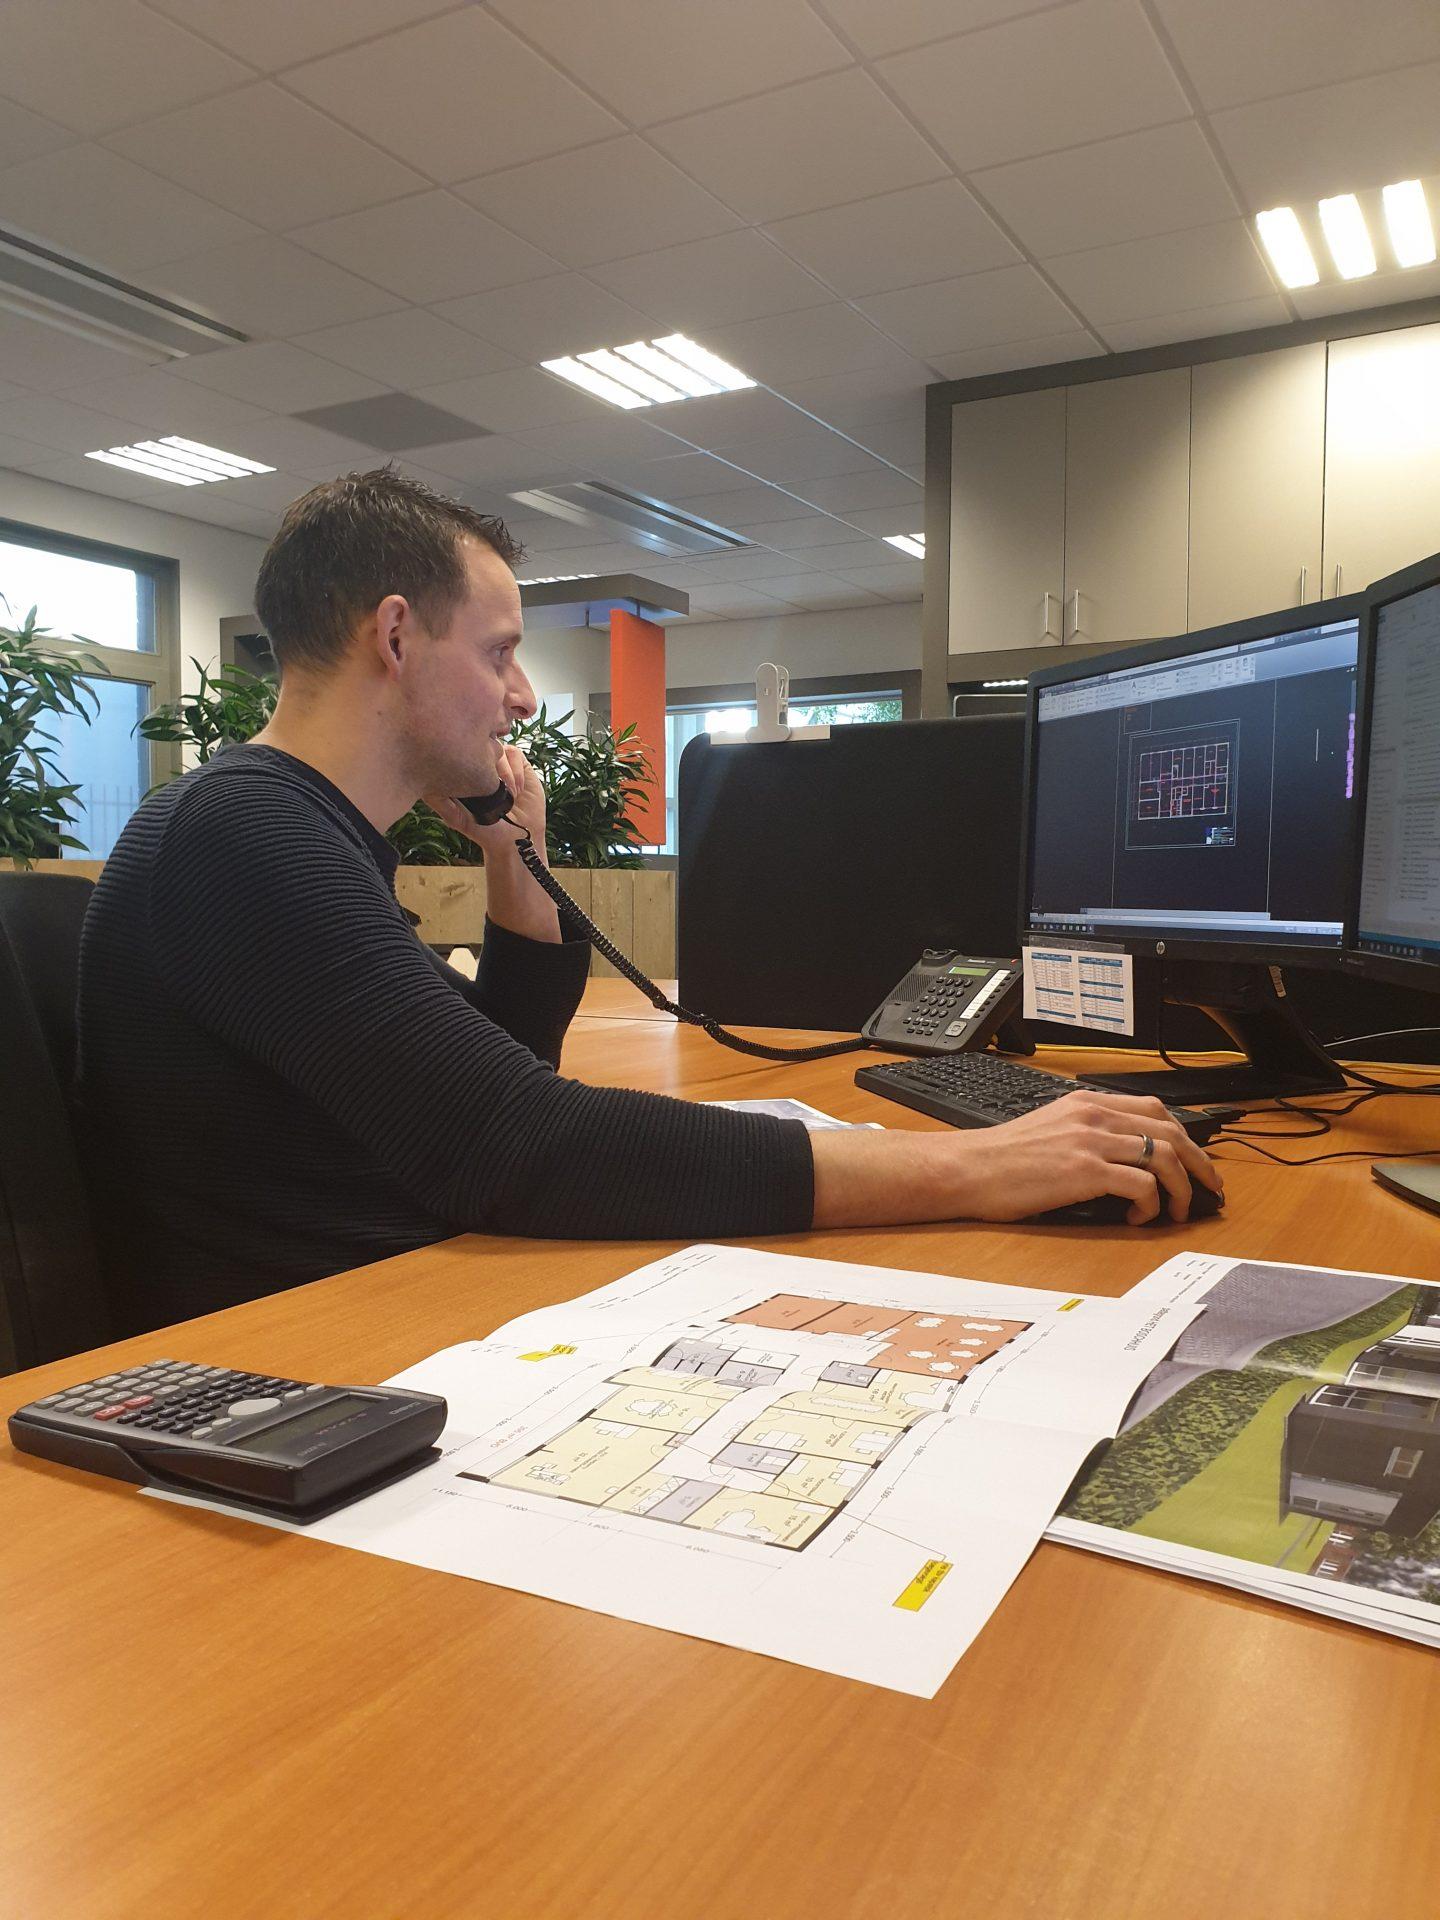 VACATURE: Werkvoorbereider / engineer